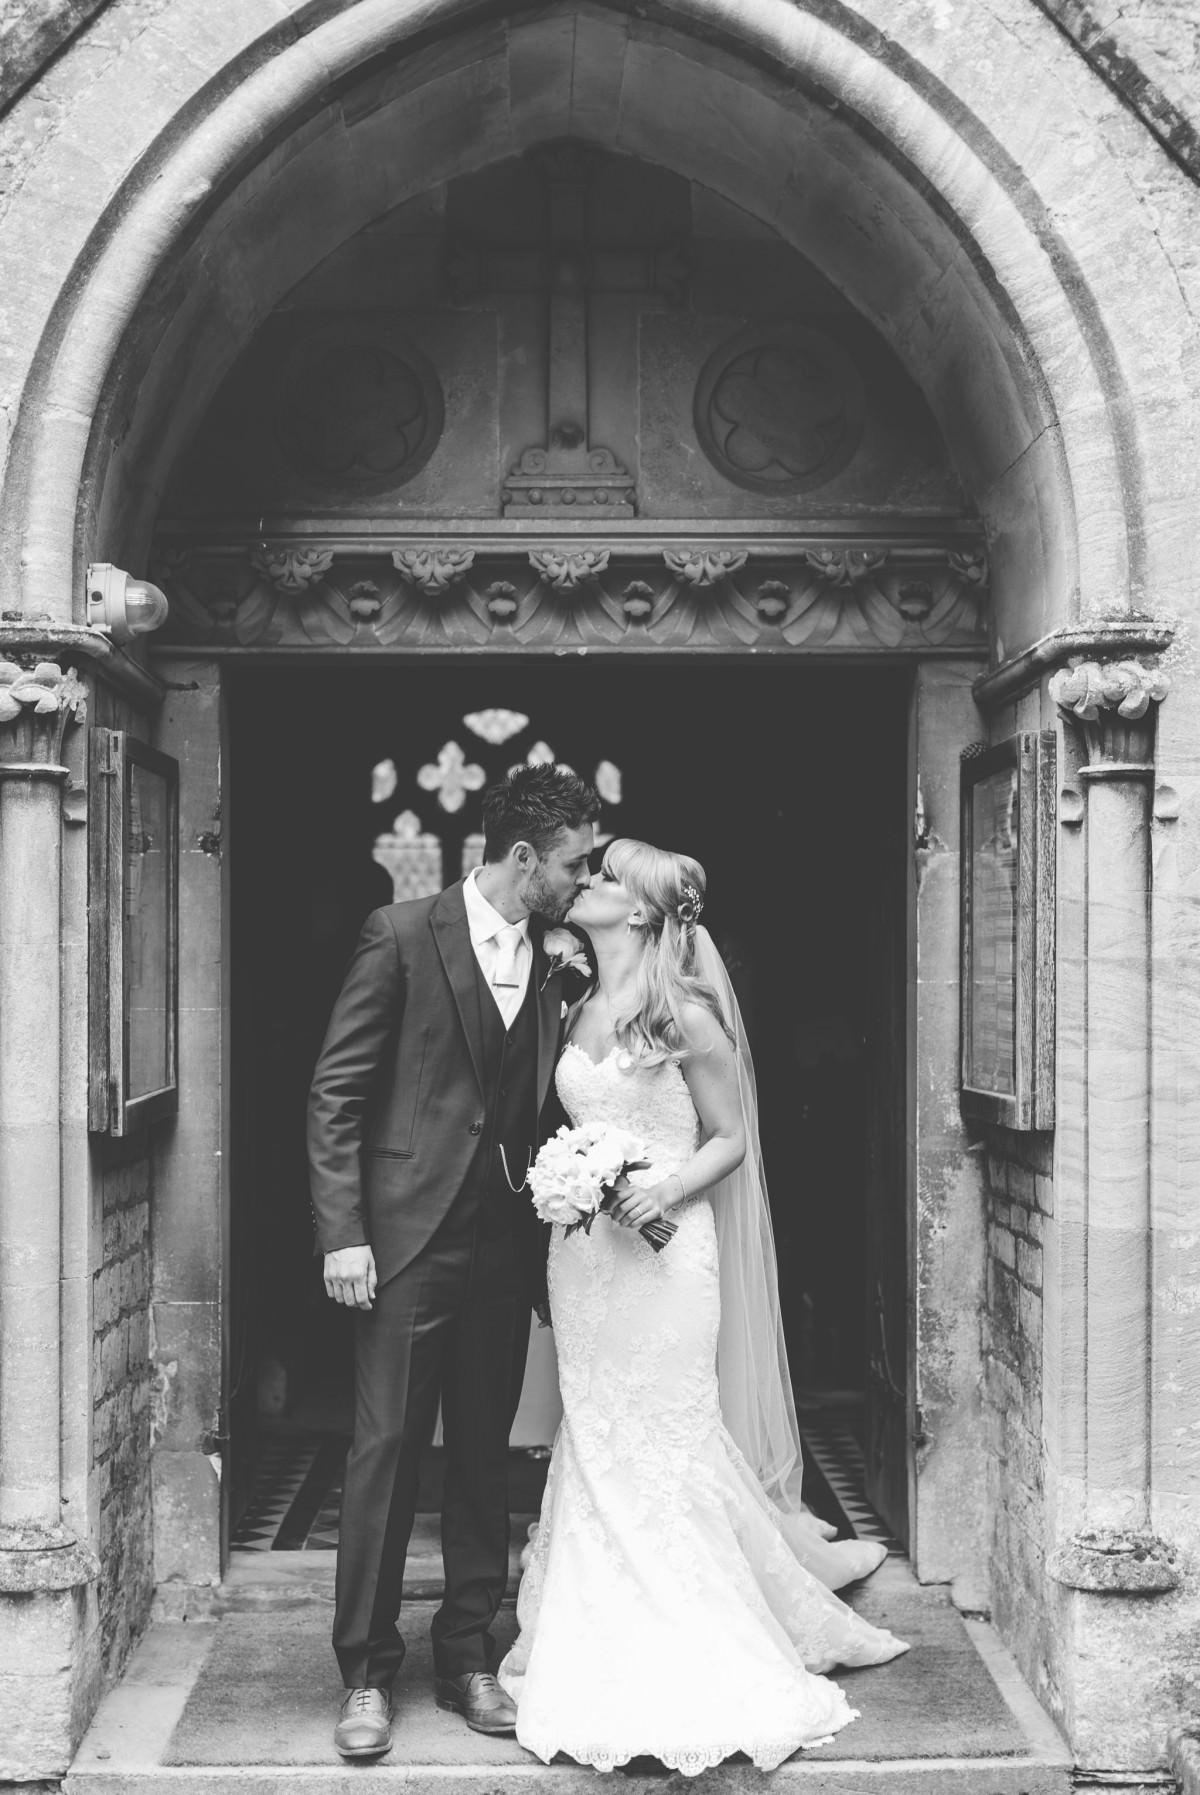 welsh_wedding_photographer_rachel_lambert_photography_lower_slaughter_manor_house_cotswolds_harriet_dean_ 24